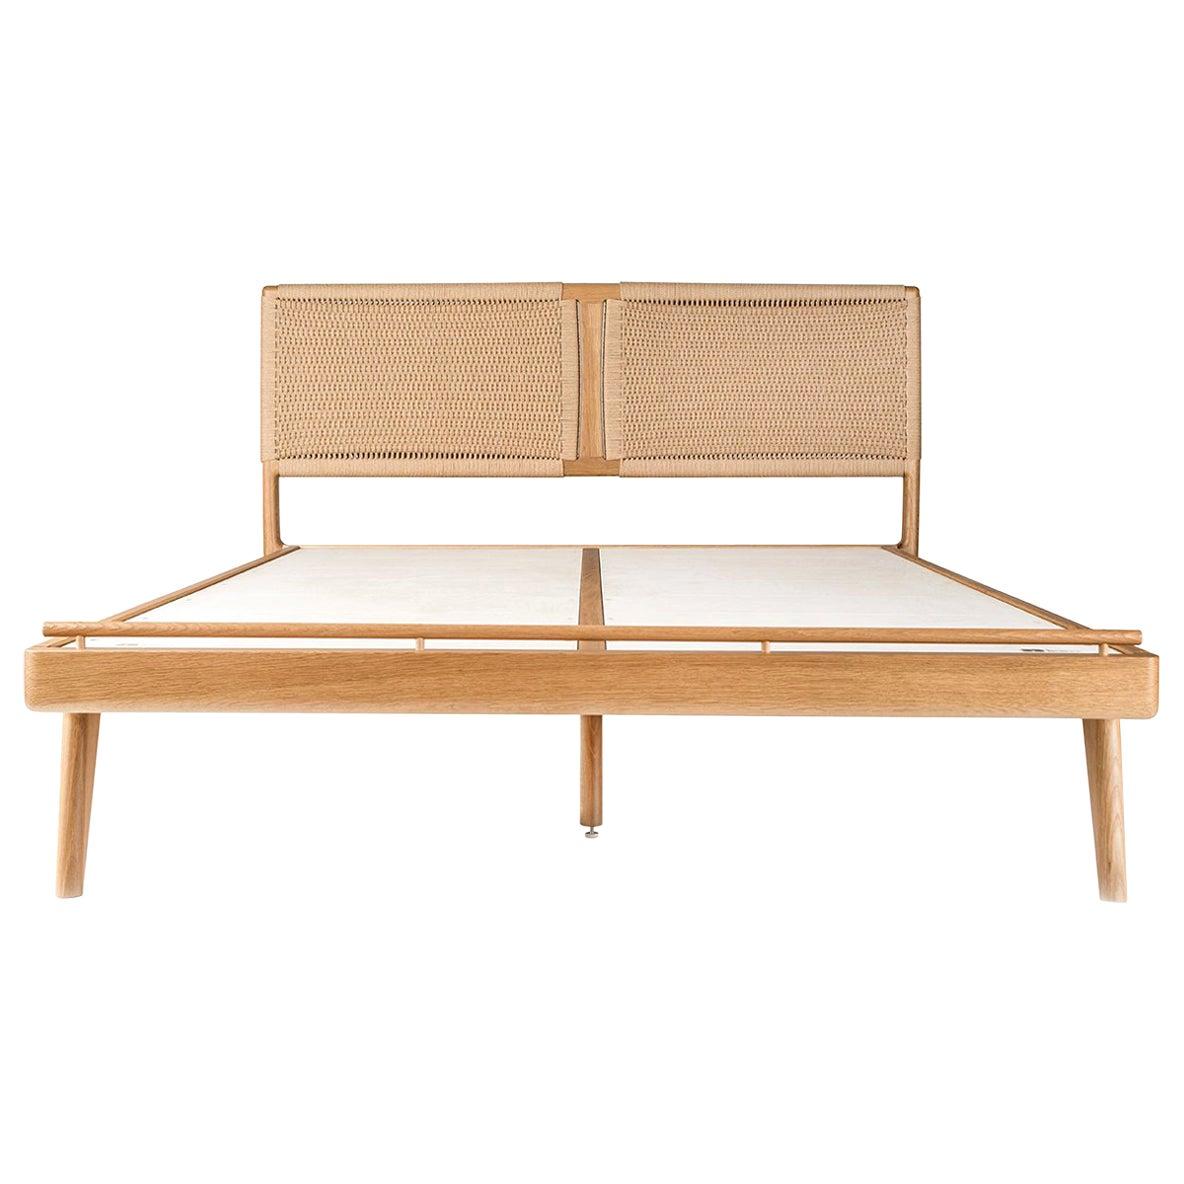 Bed, Headboard, Danish Cord, Custom, Mid Century Modern-Style, Woven, Hardwood,